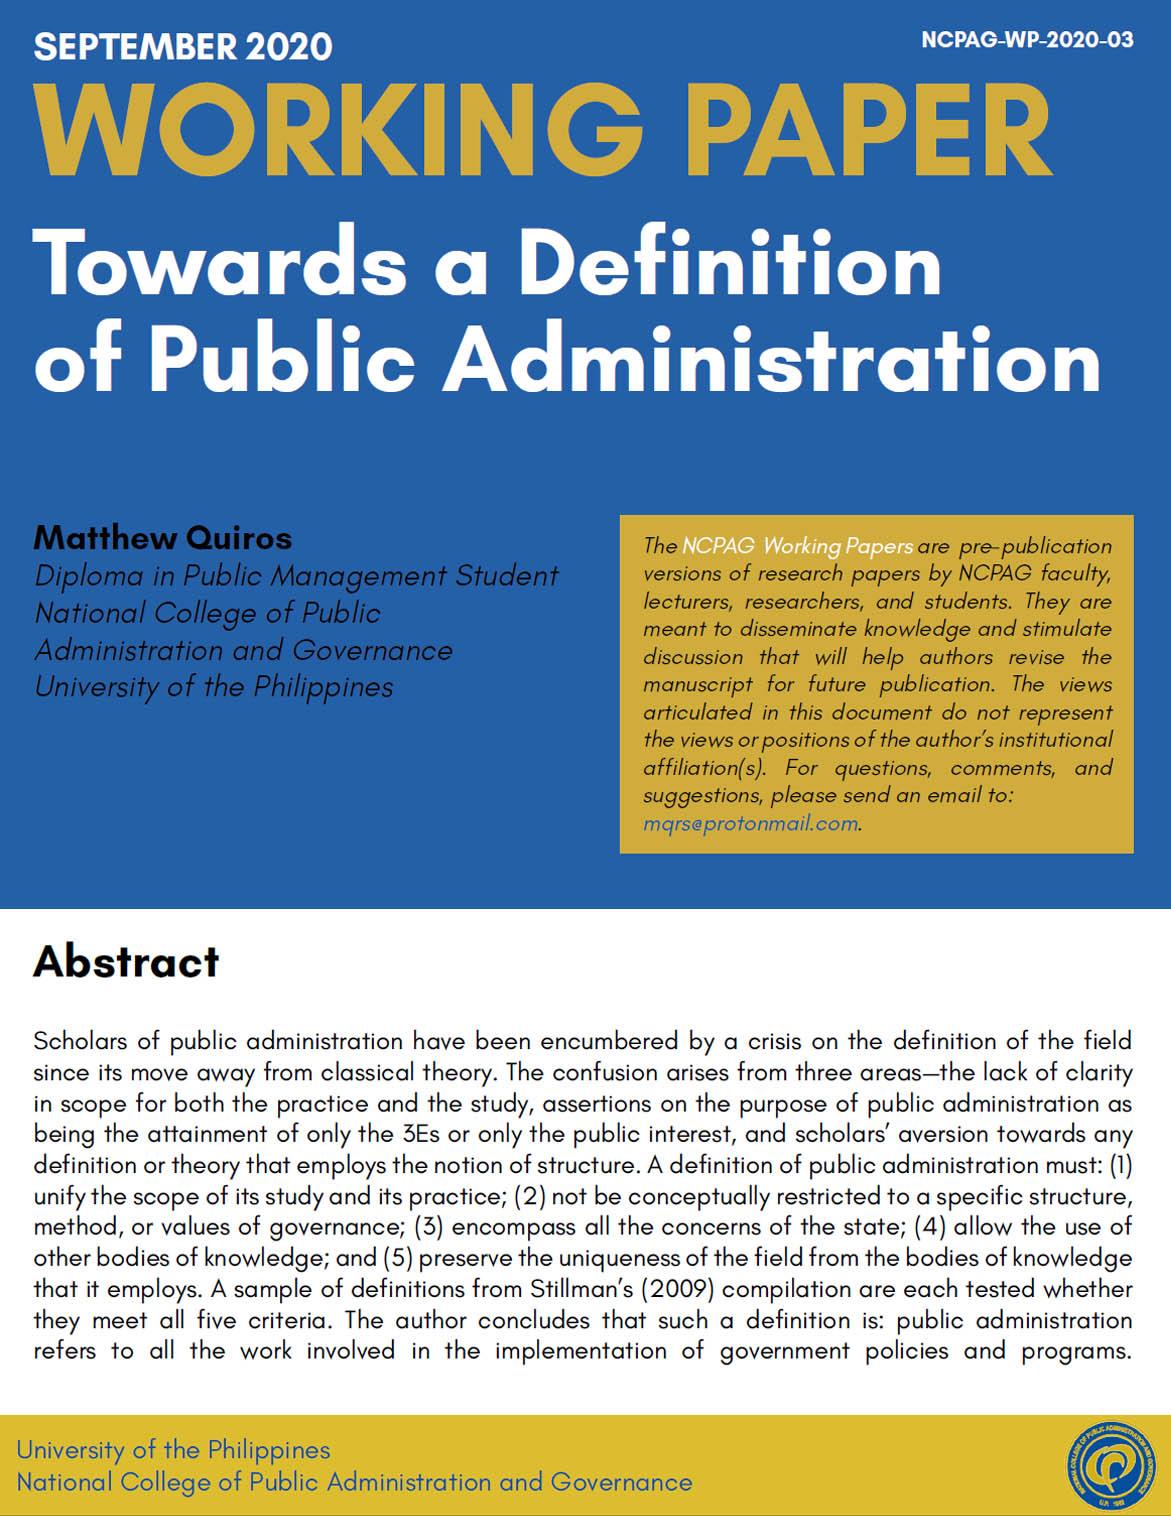 Click image to download pdf copy.